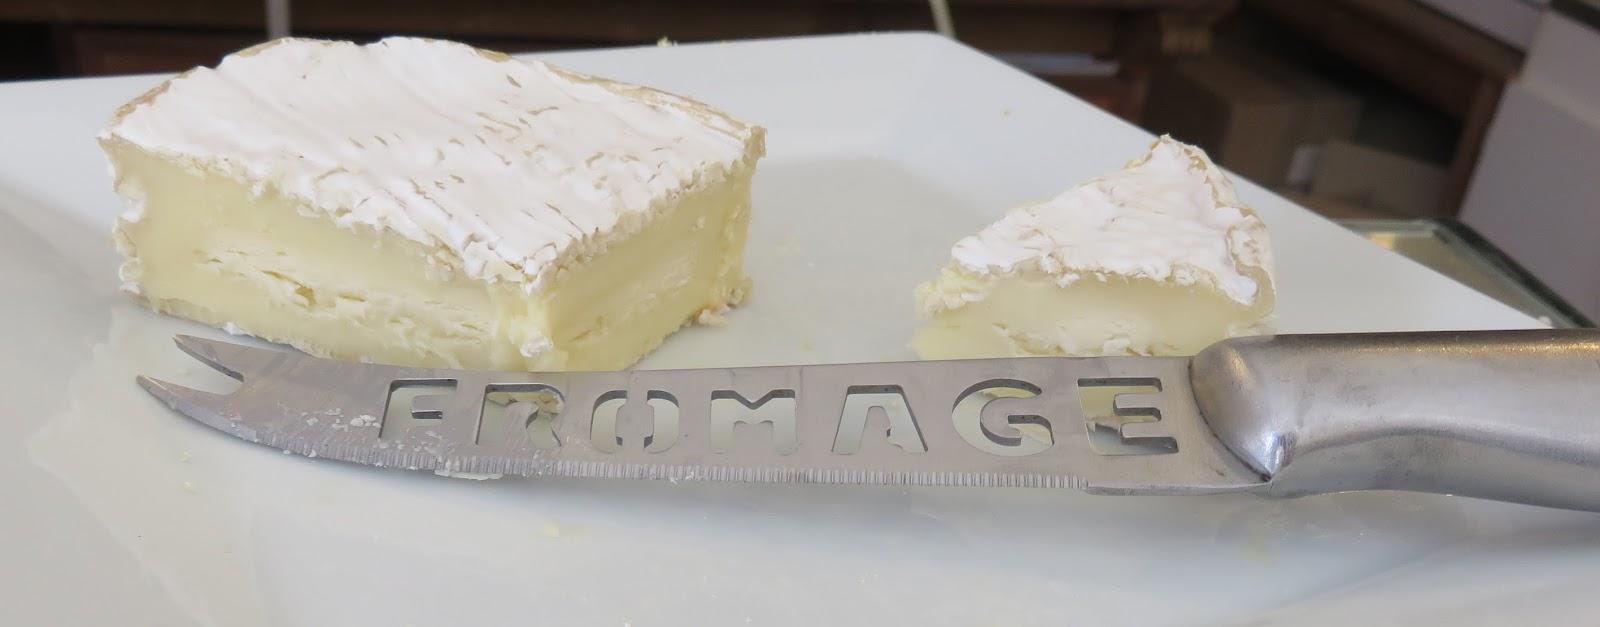 camembert-durand.jpg